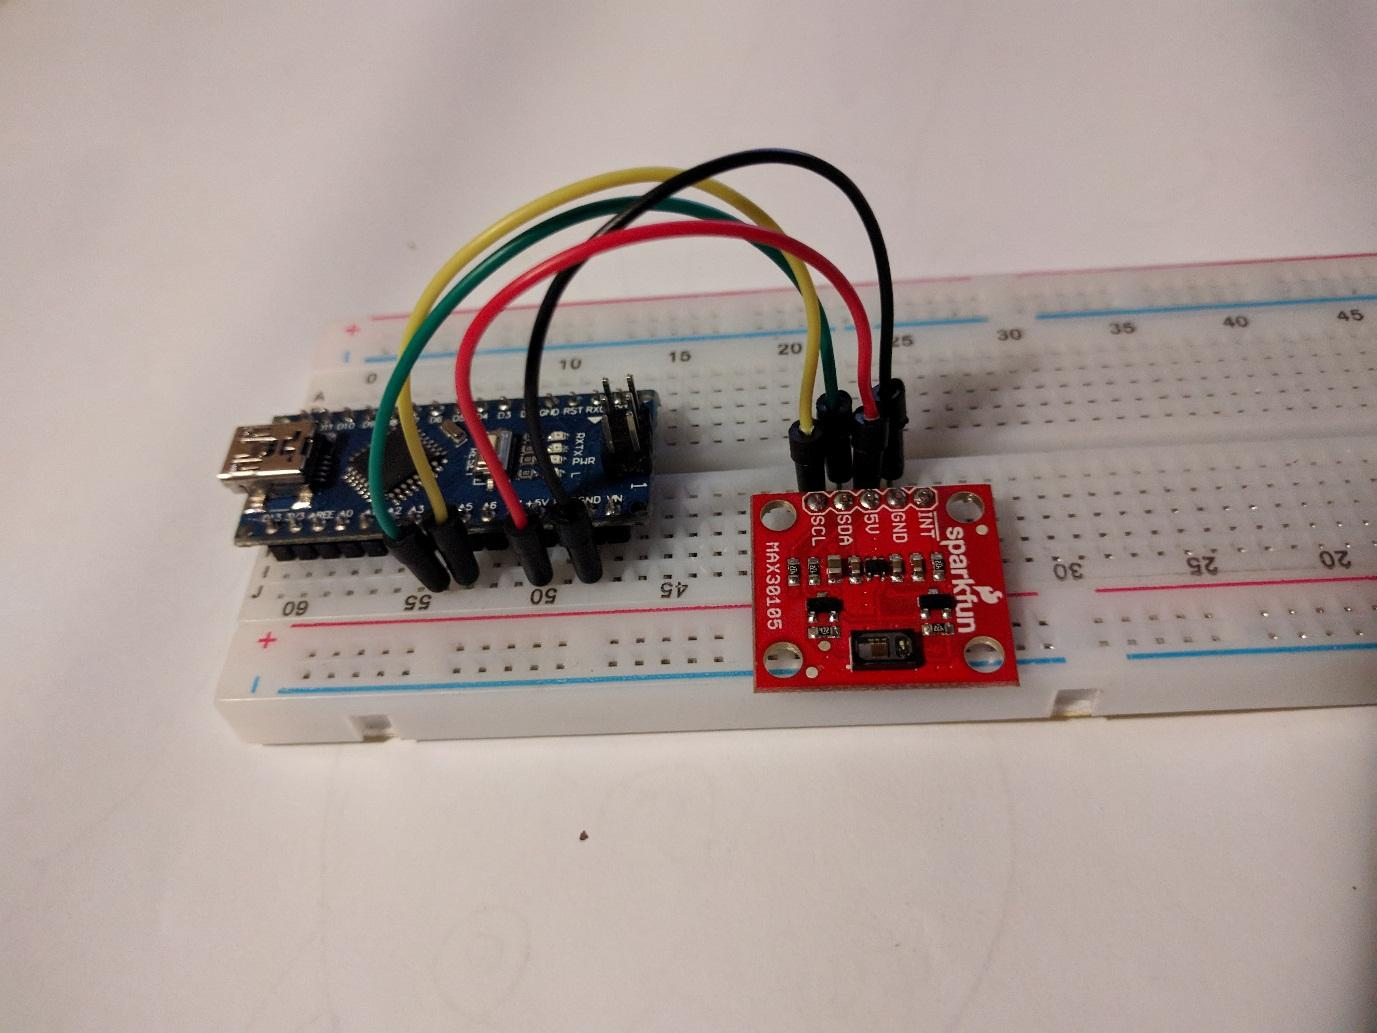 Project Virtual Herder Overview Adafruit Microphone Amplifier Breakout Learning Cuserstiandesktoparduino Max30105